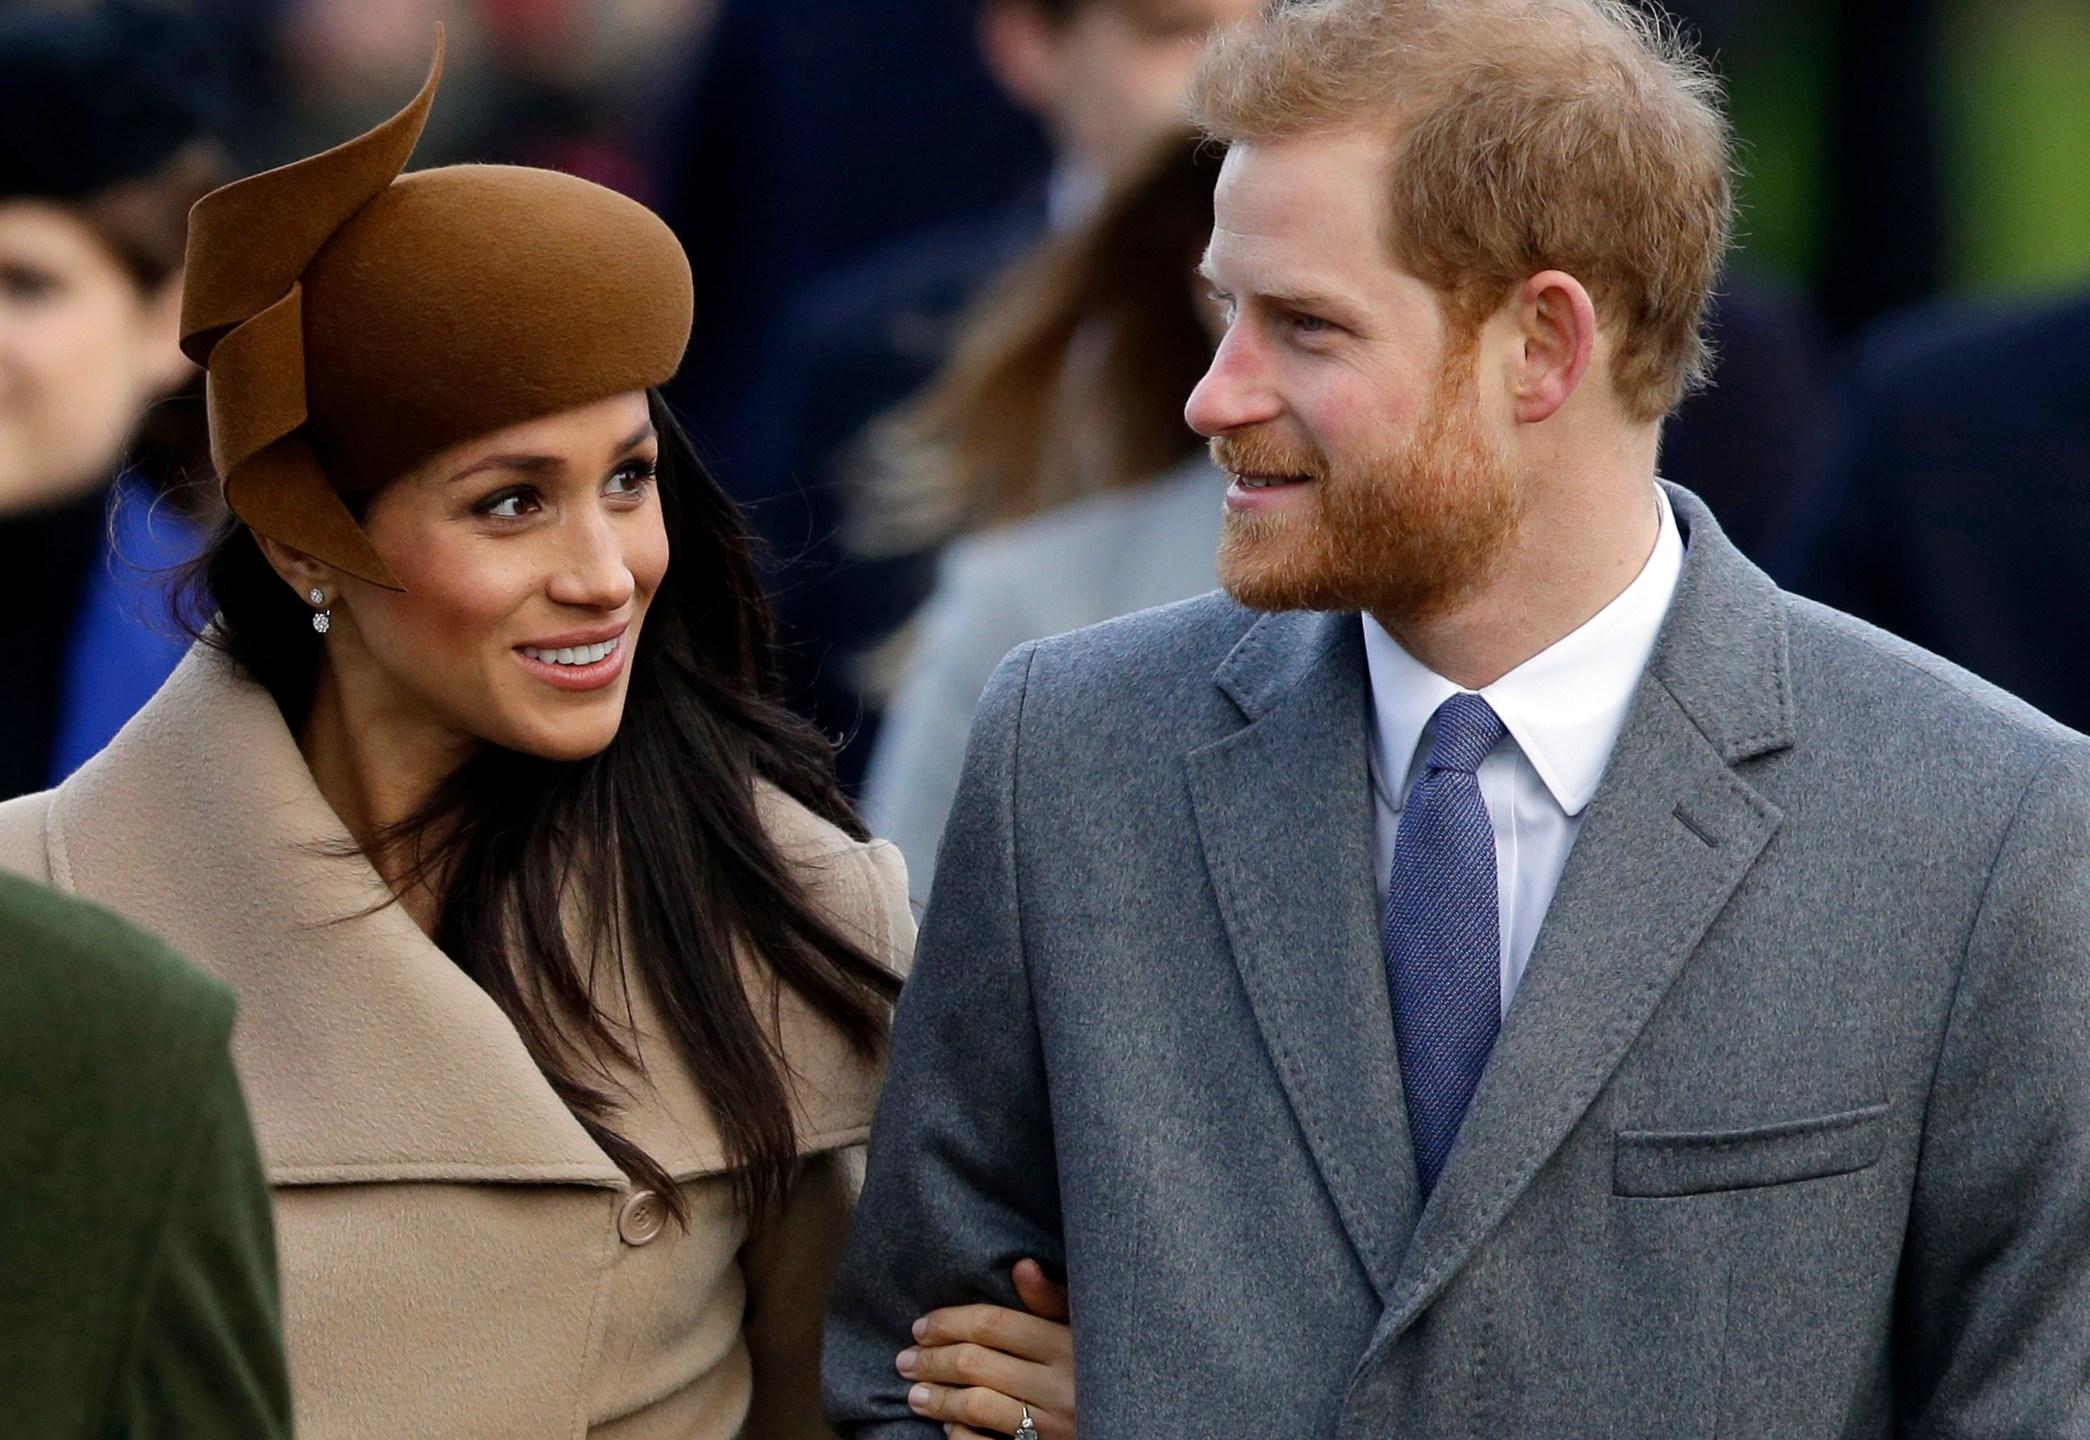 Britain_Royal_Wedding_99357-159532.jpg68466592